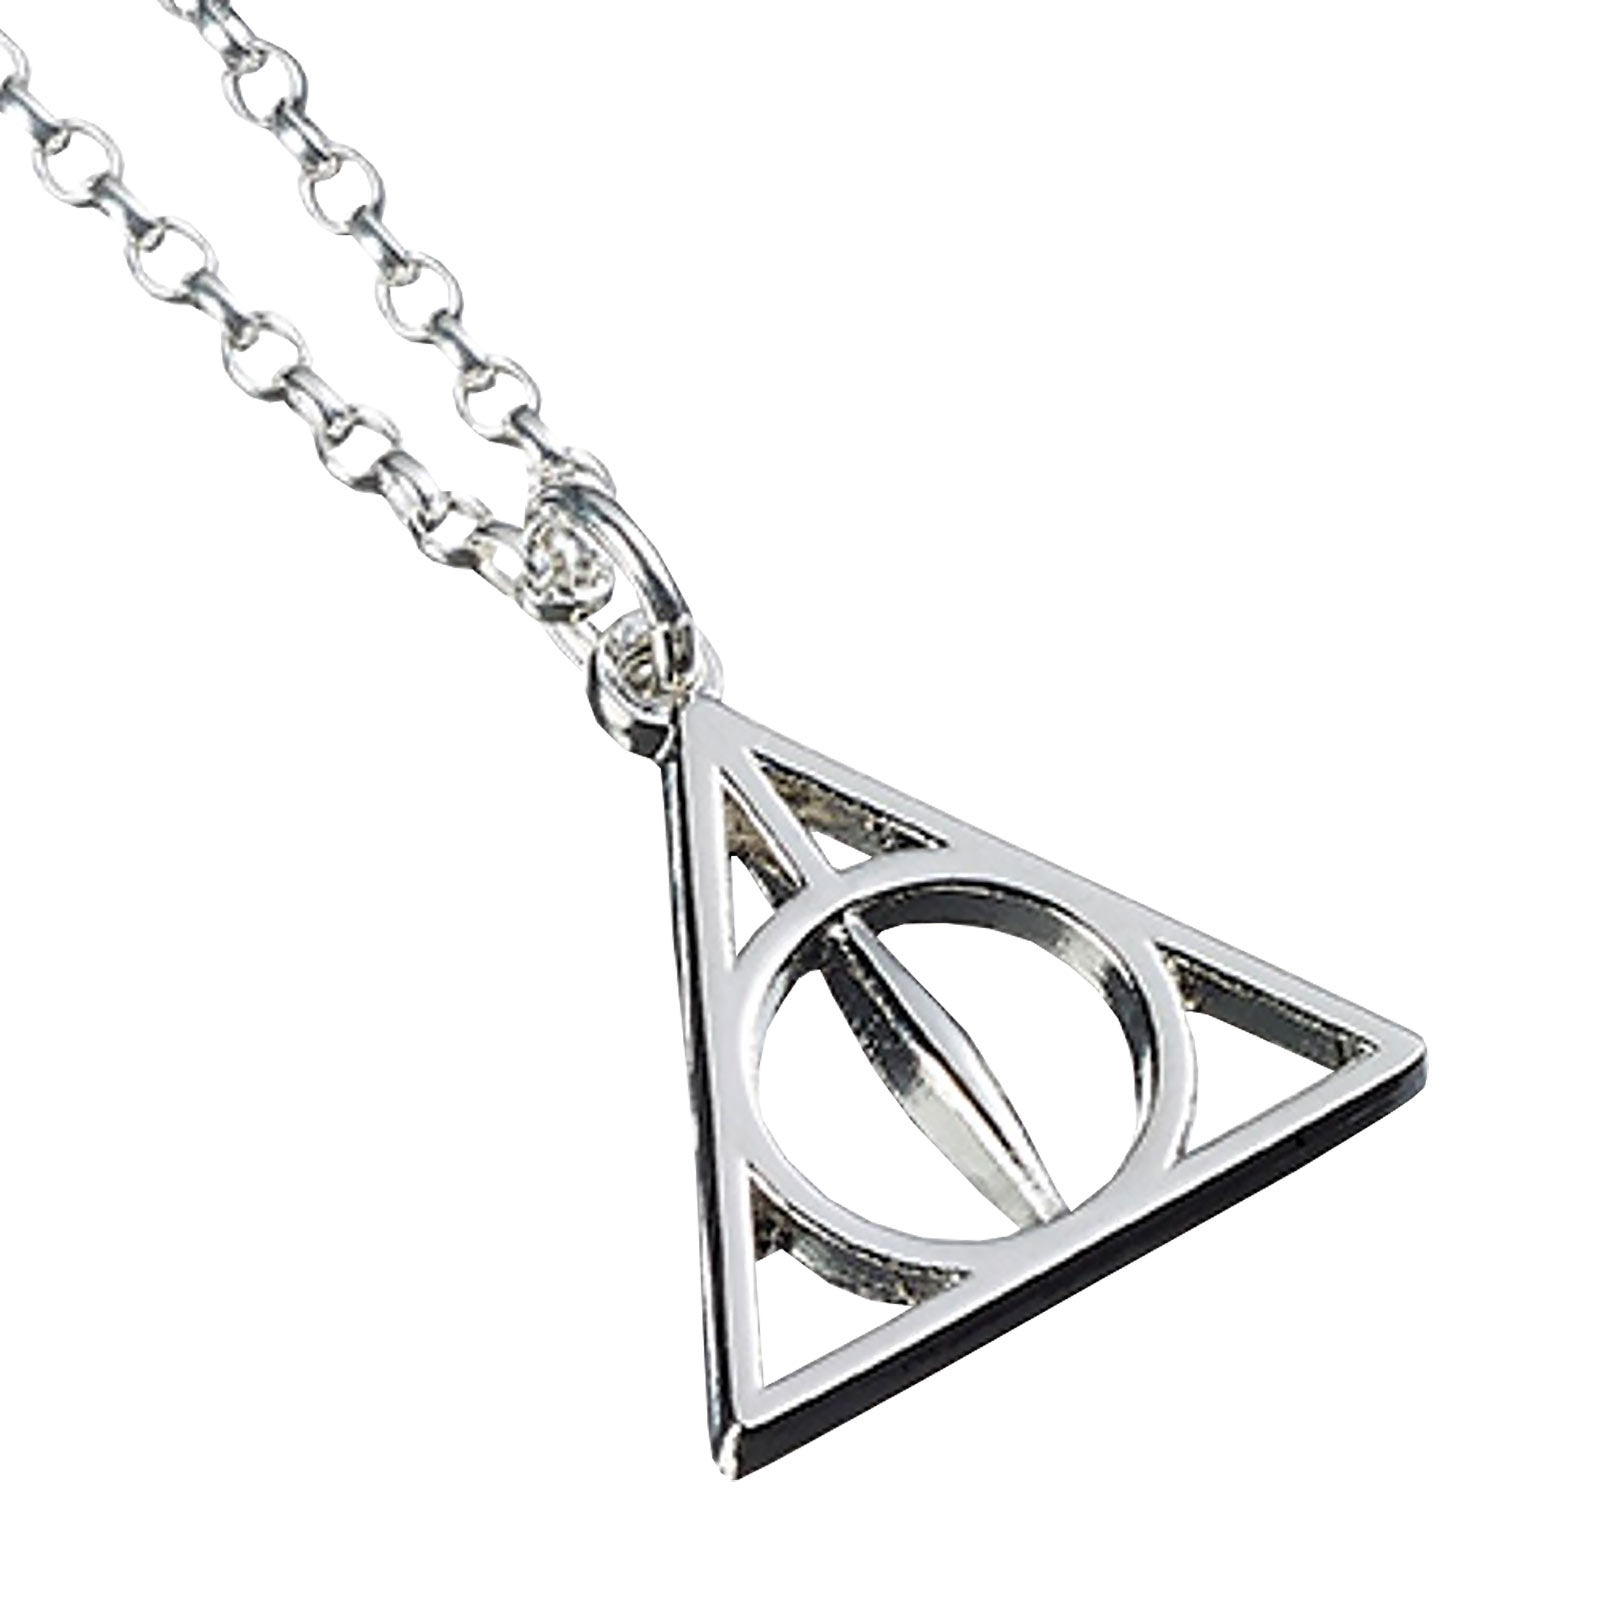 Harry Potter - Deathly Hallows Halskette